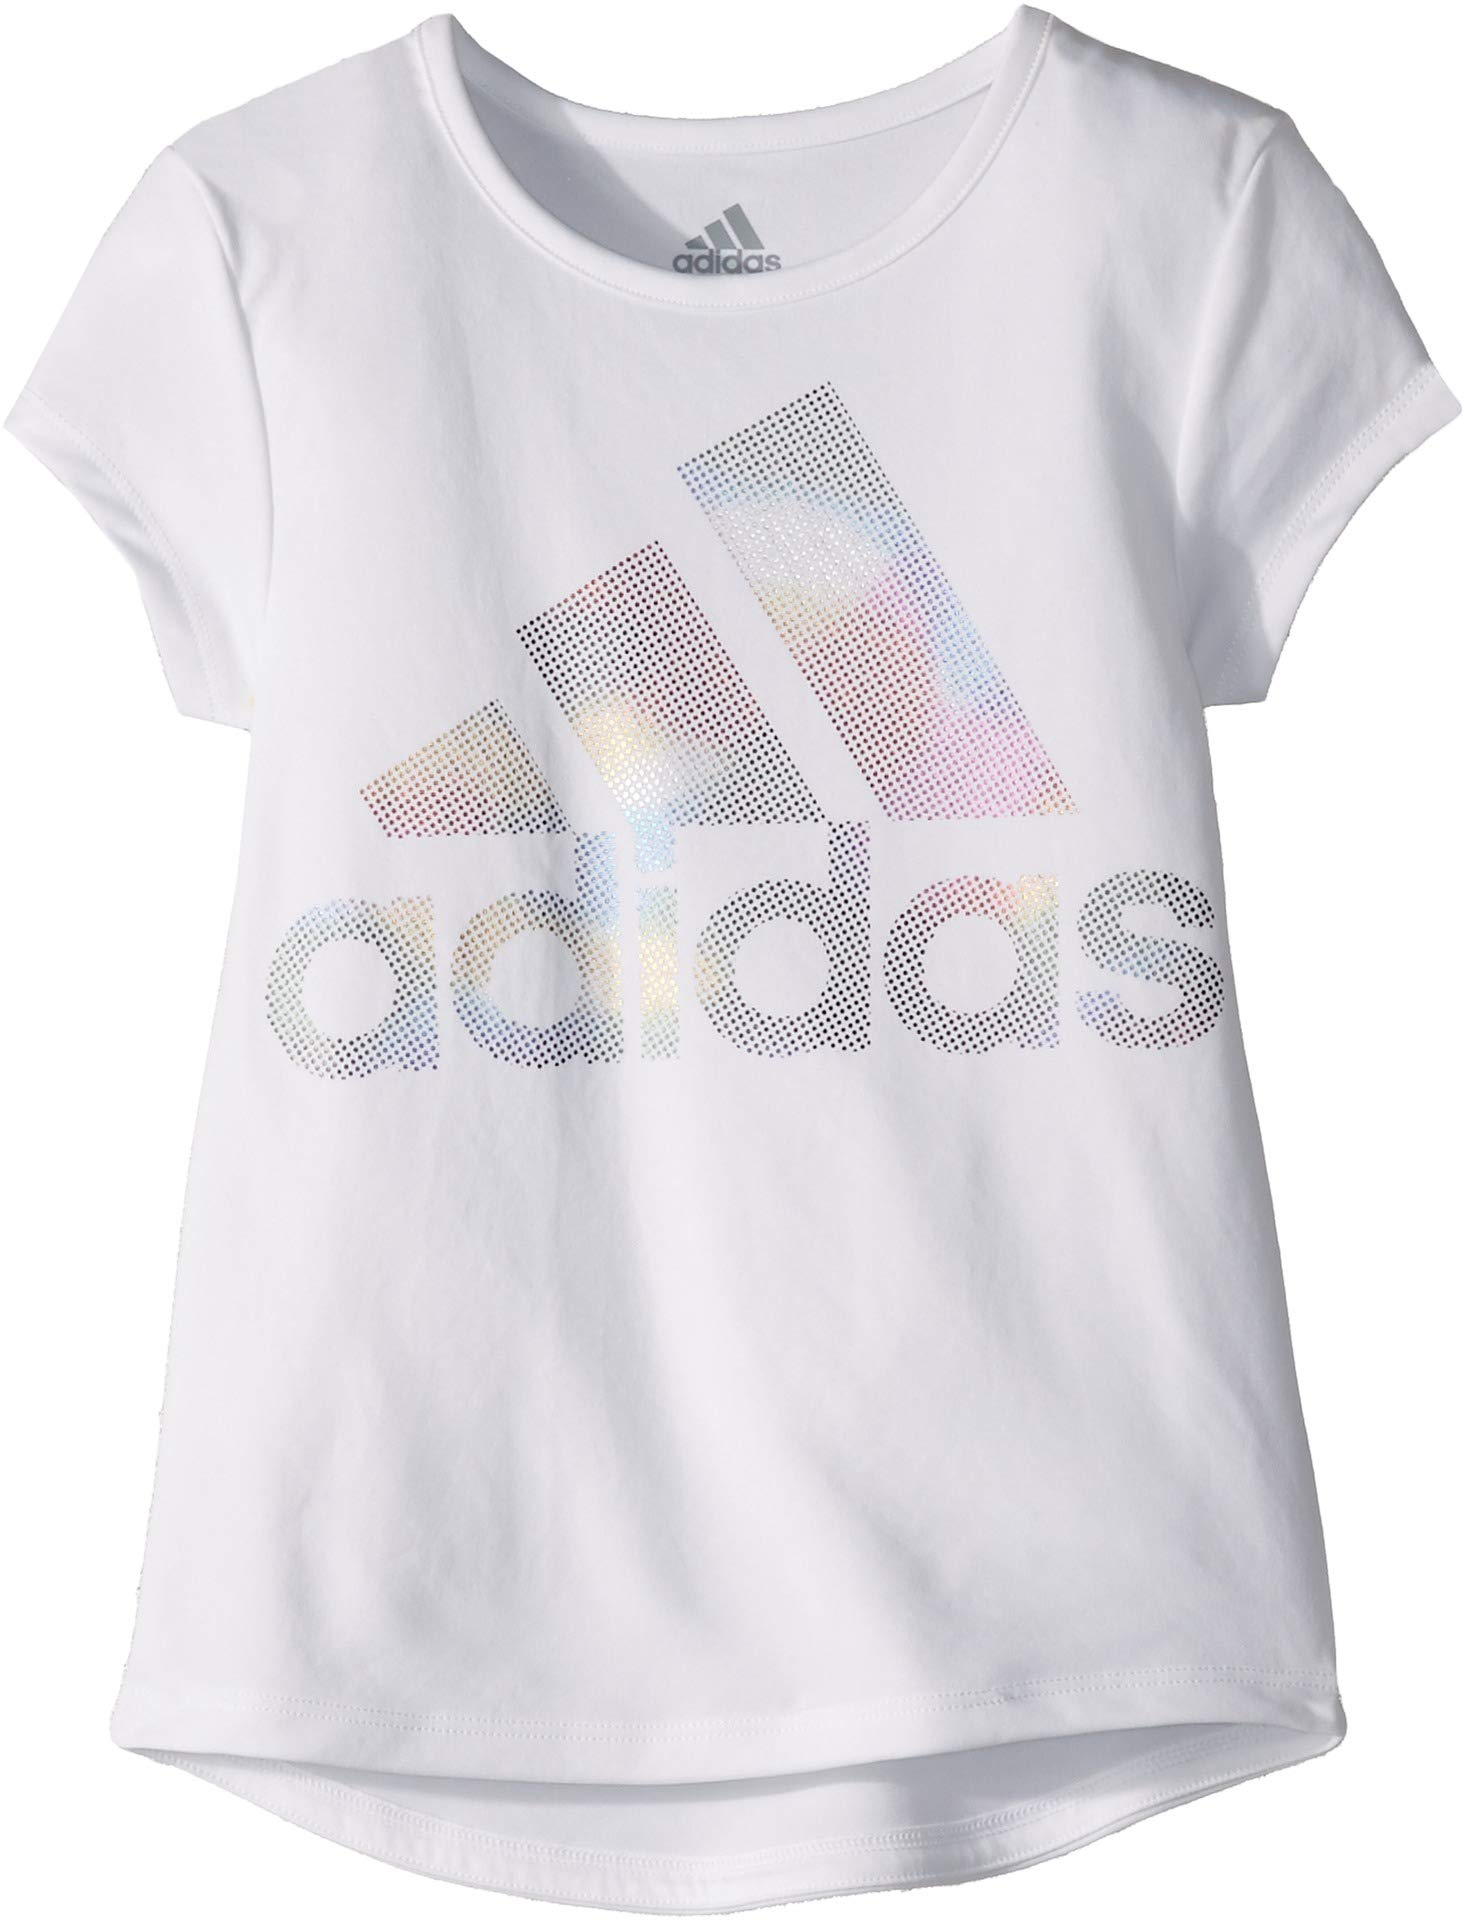 Rainbow Baby Shirt: Adidas Kids Baby Girl's Short Sleeve Rainbow Foil Shirt